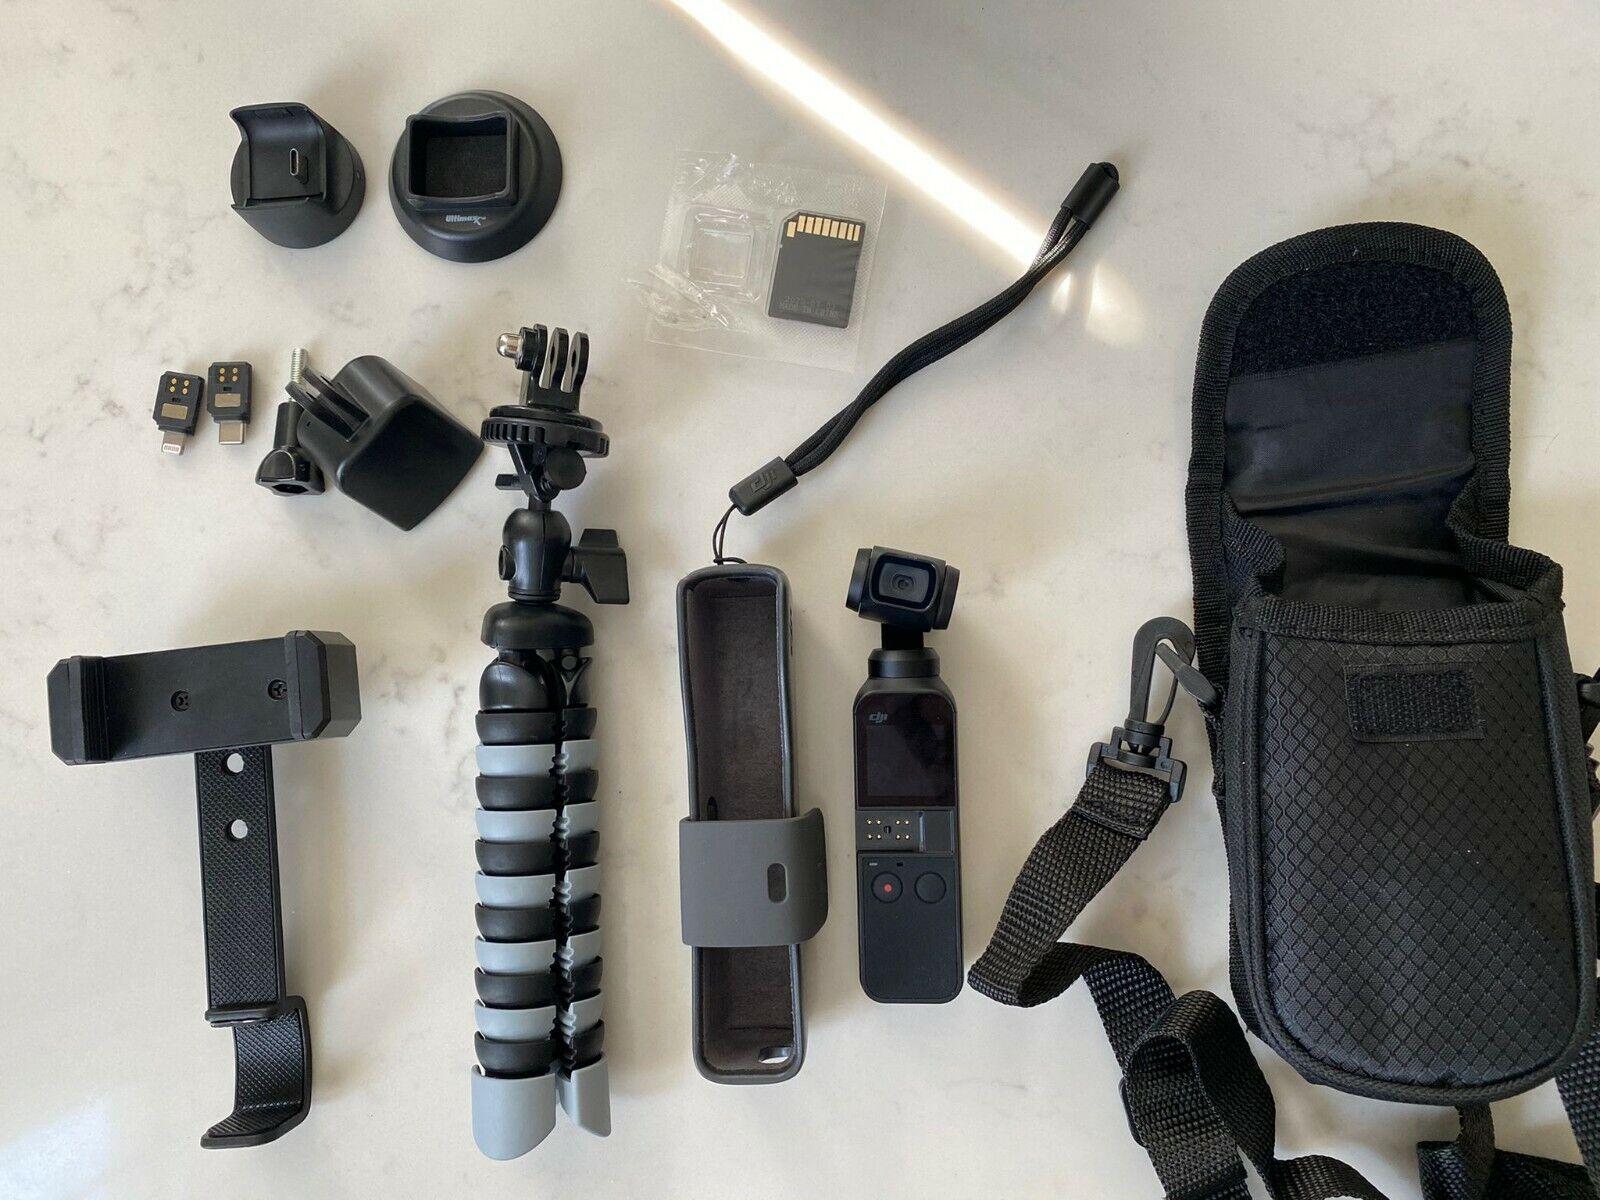 DJI Osmo Pocket Camera Everything Included Tripod, Phone Holder, Gopro Adapter. - $340.00